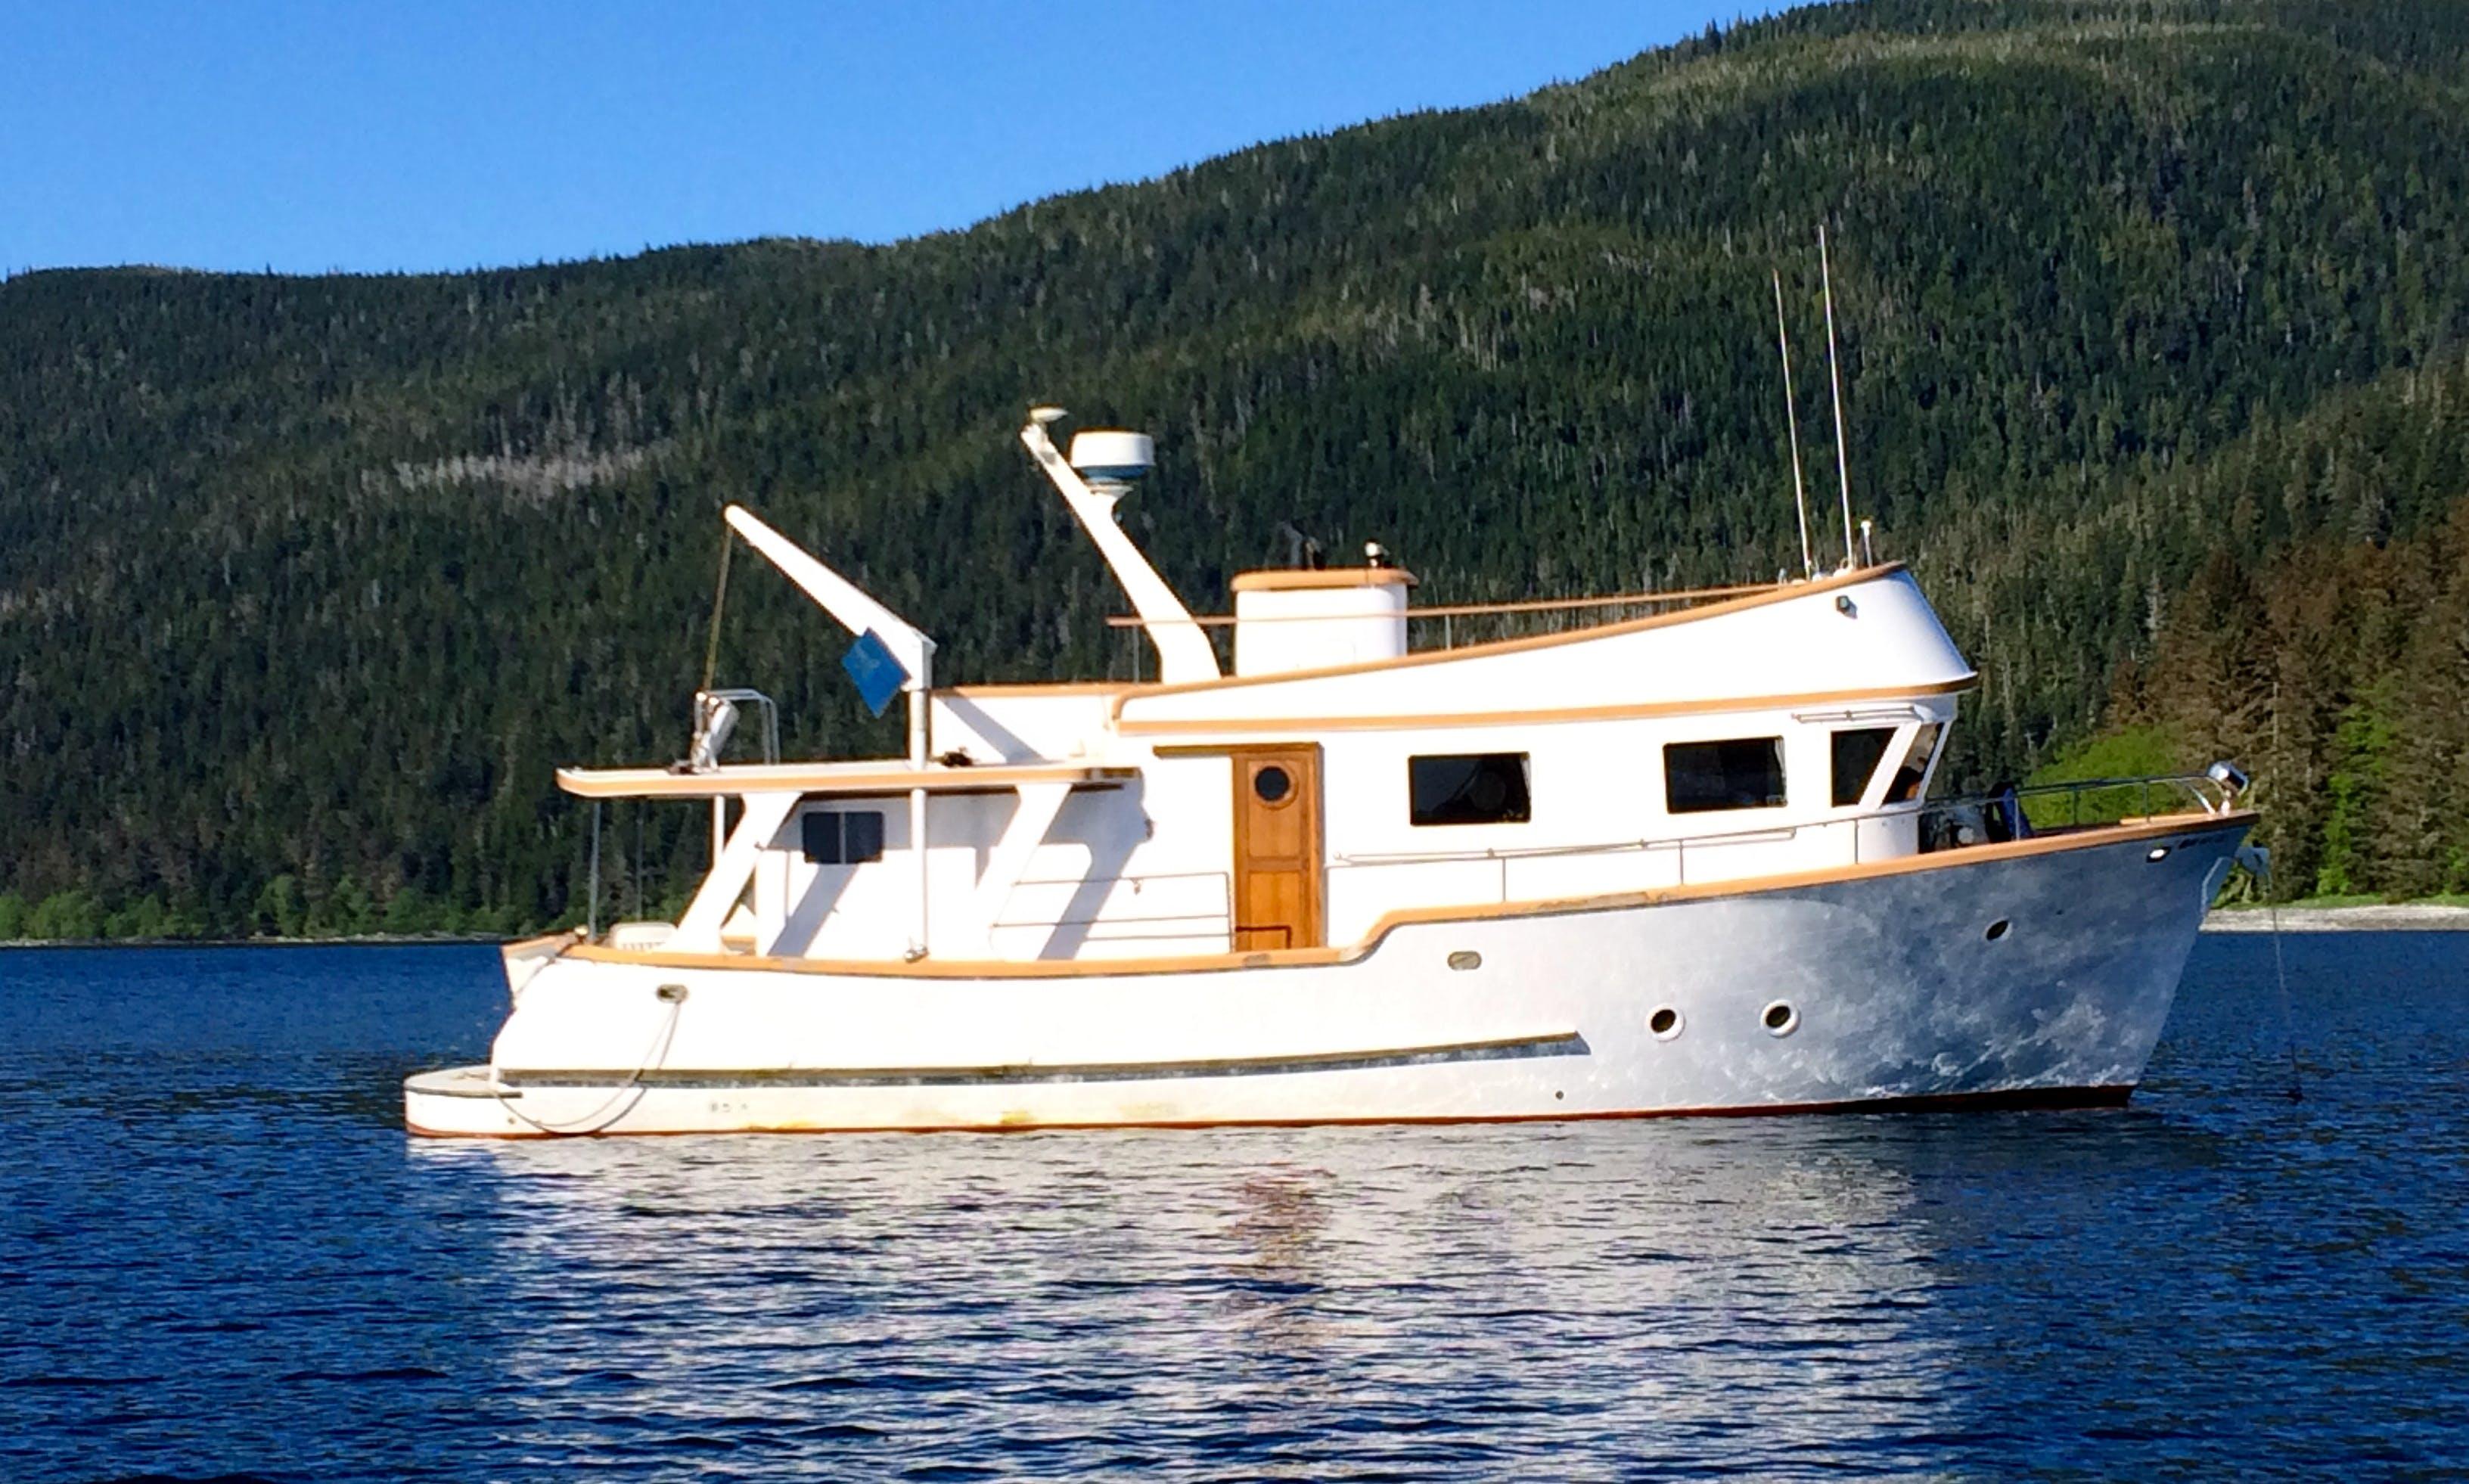 Trawler rental in Juneau